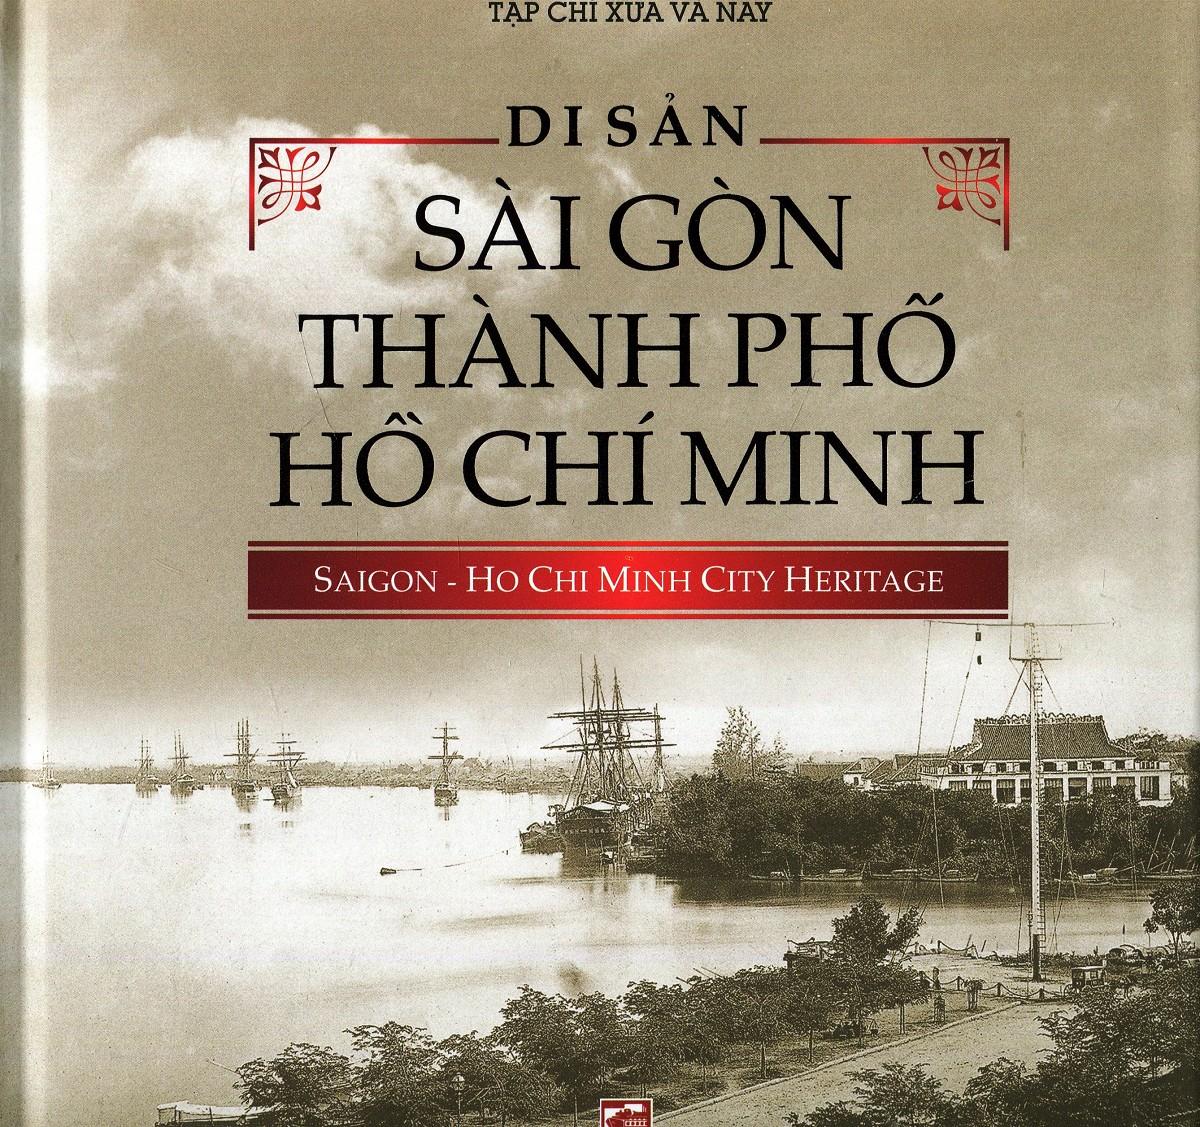 di-san-sai-gon-thanh-pho-ho-chi-minh.u2469.d20170117.t164742.262242.jpg